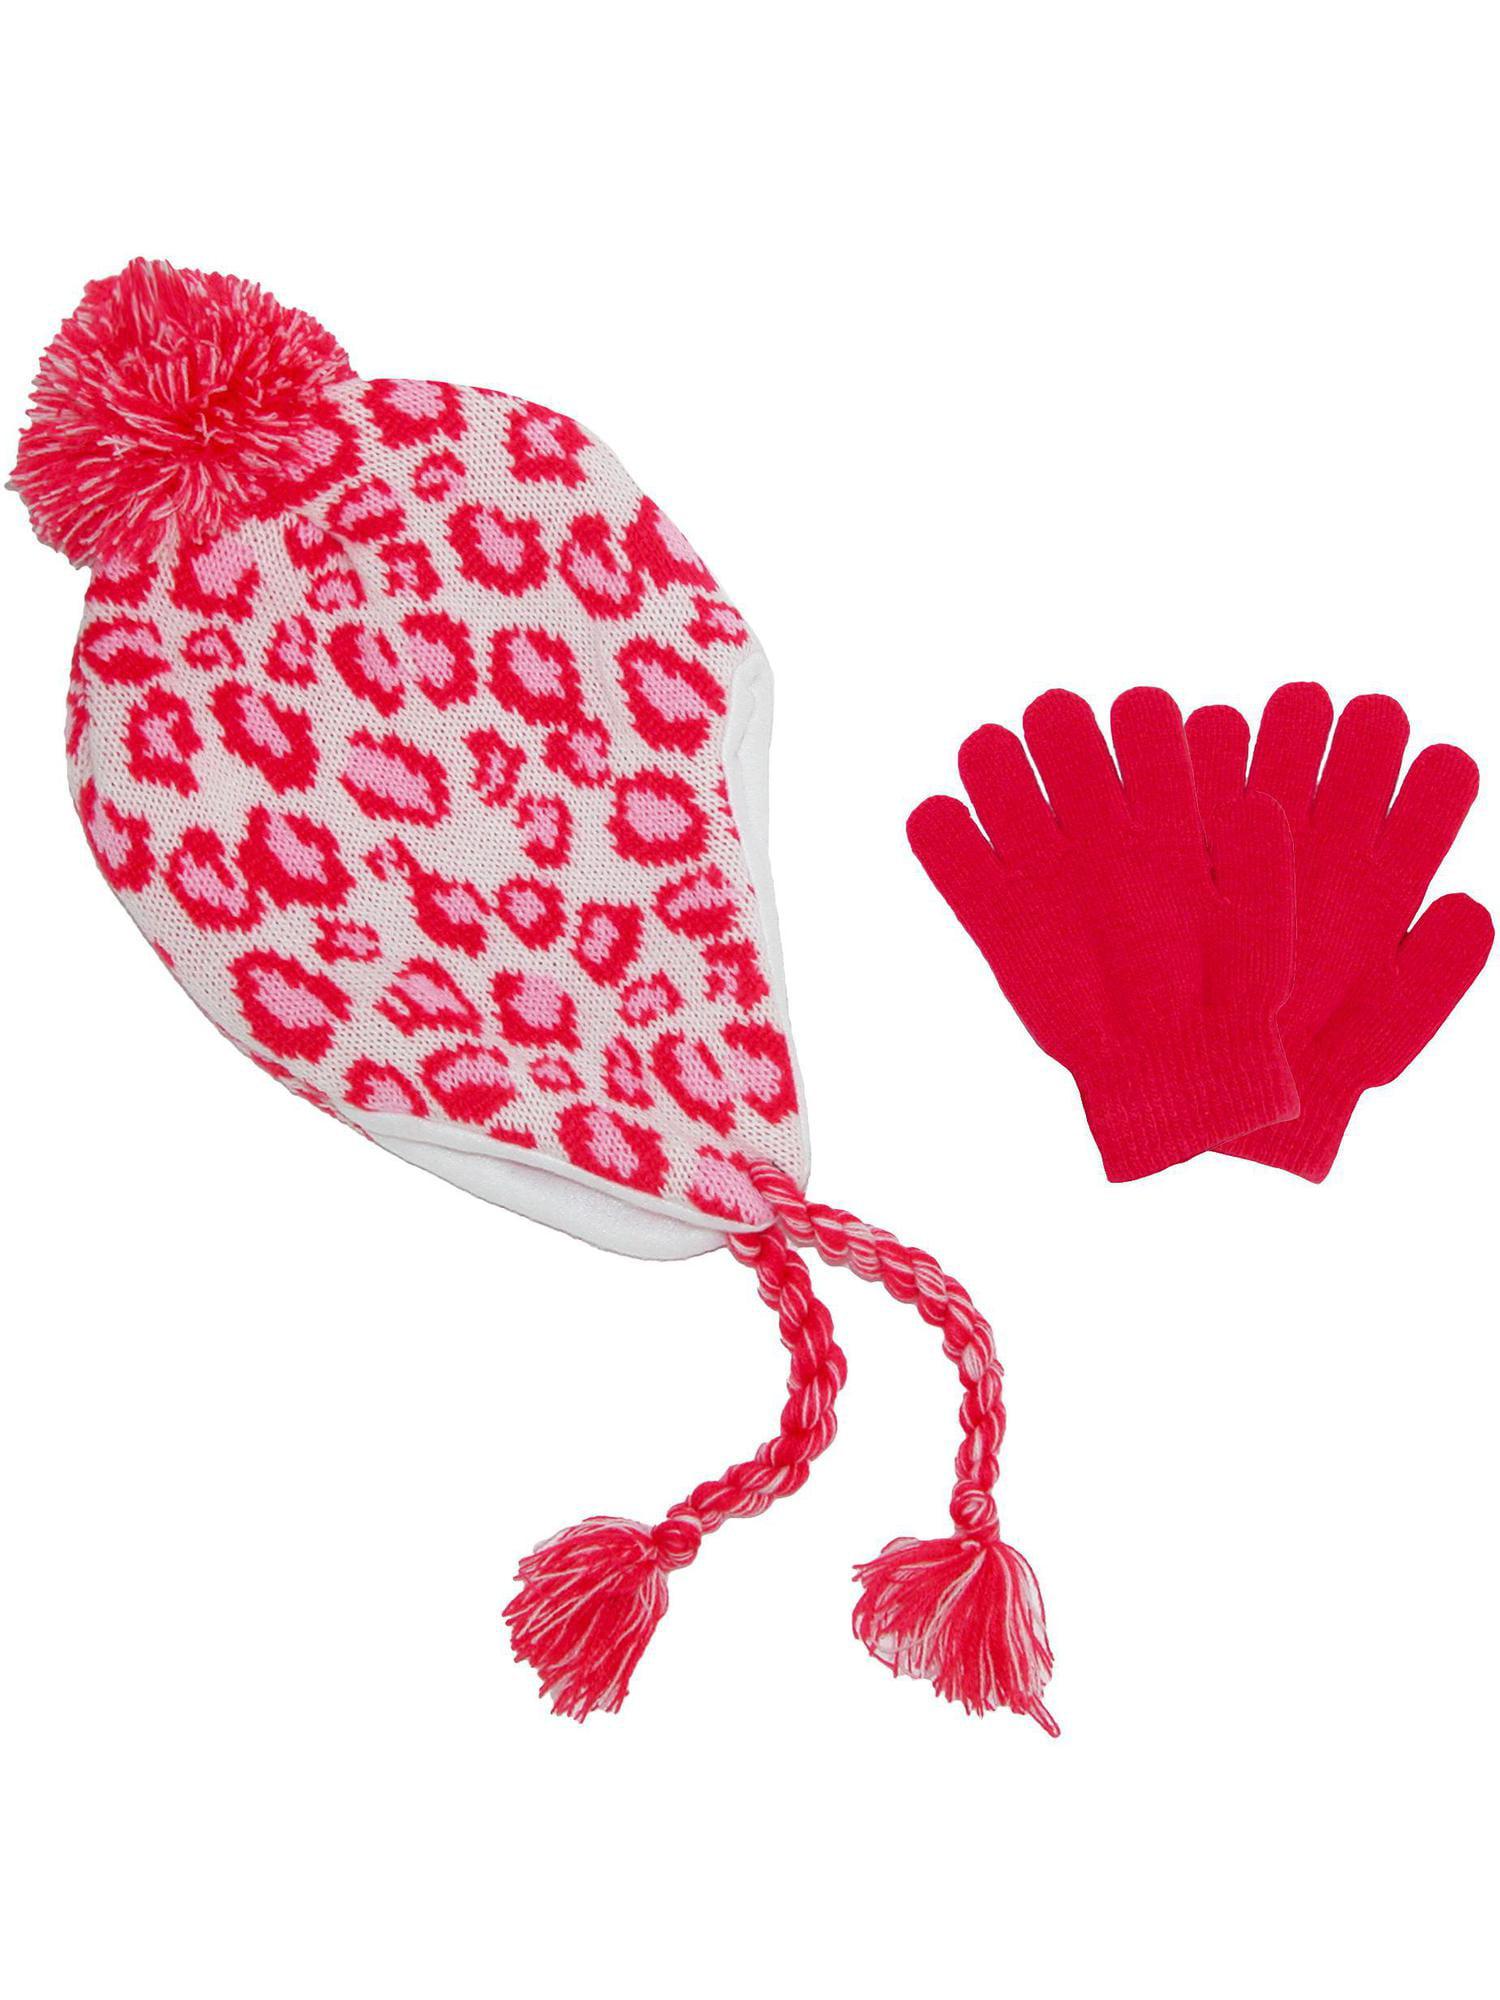 Girls' & Teens' Fleece Lined Animal Print Hat and Glove Set